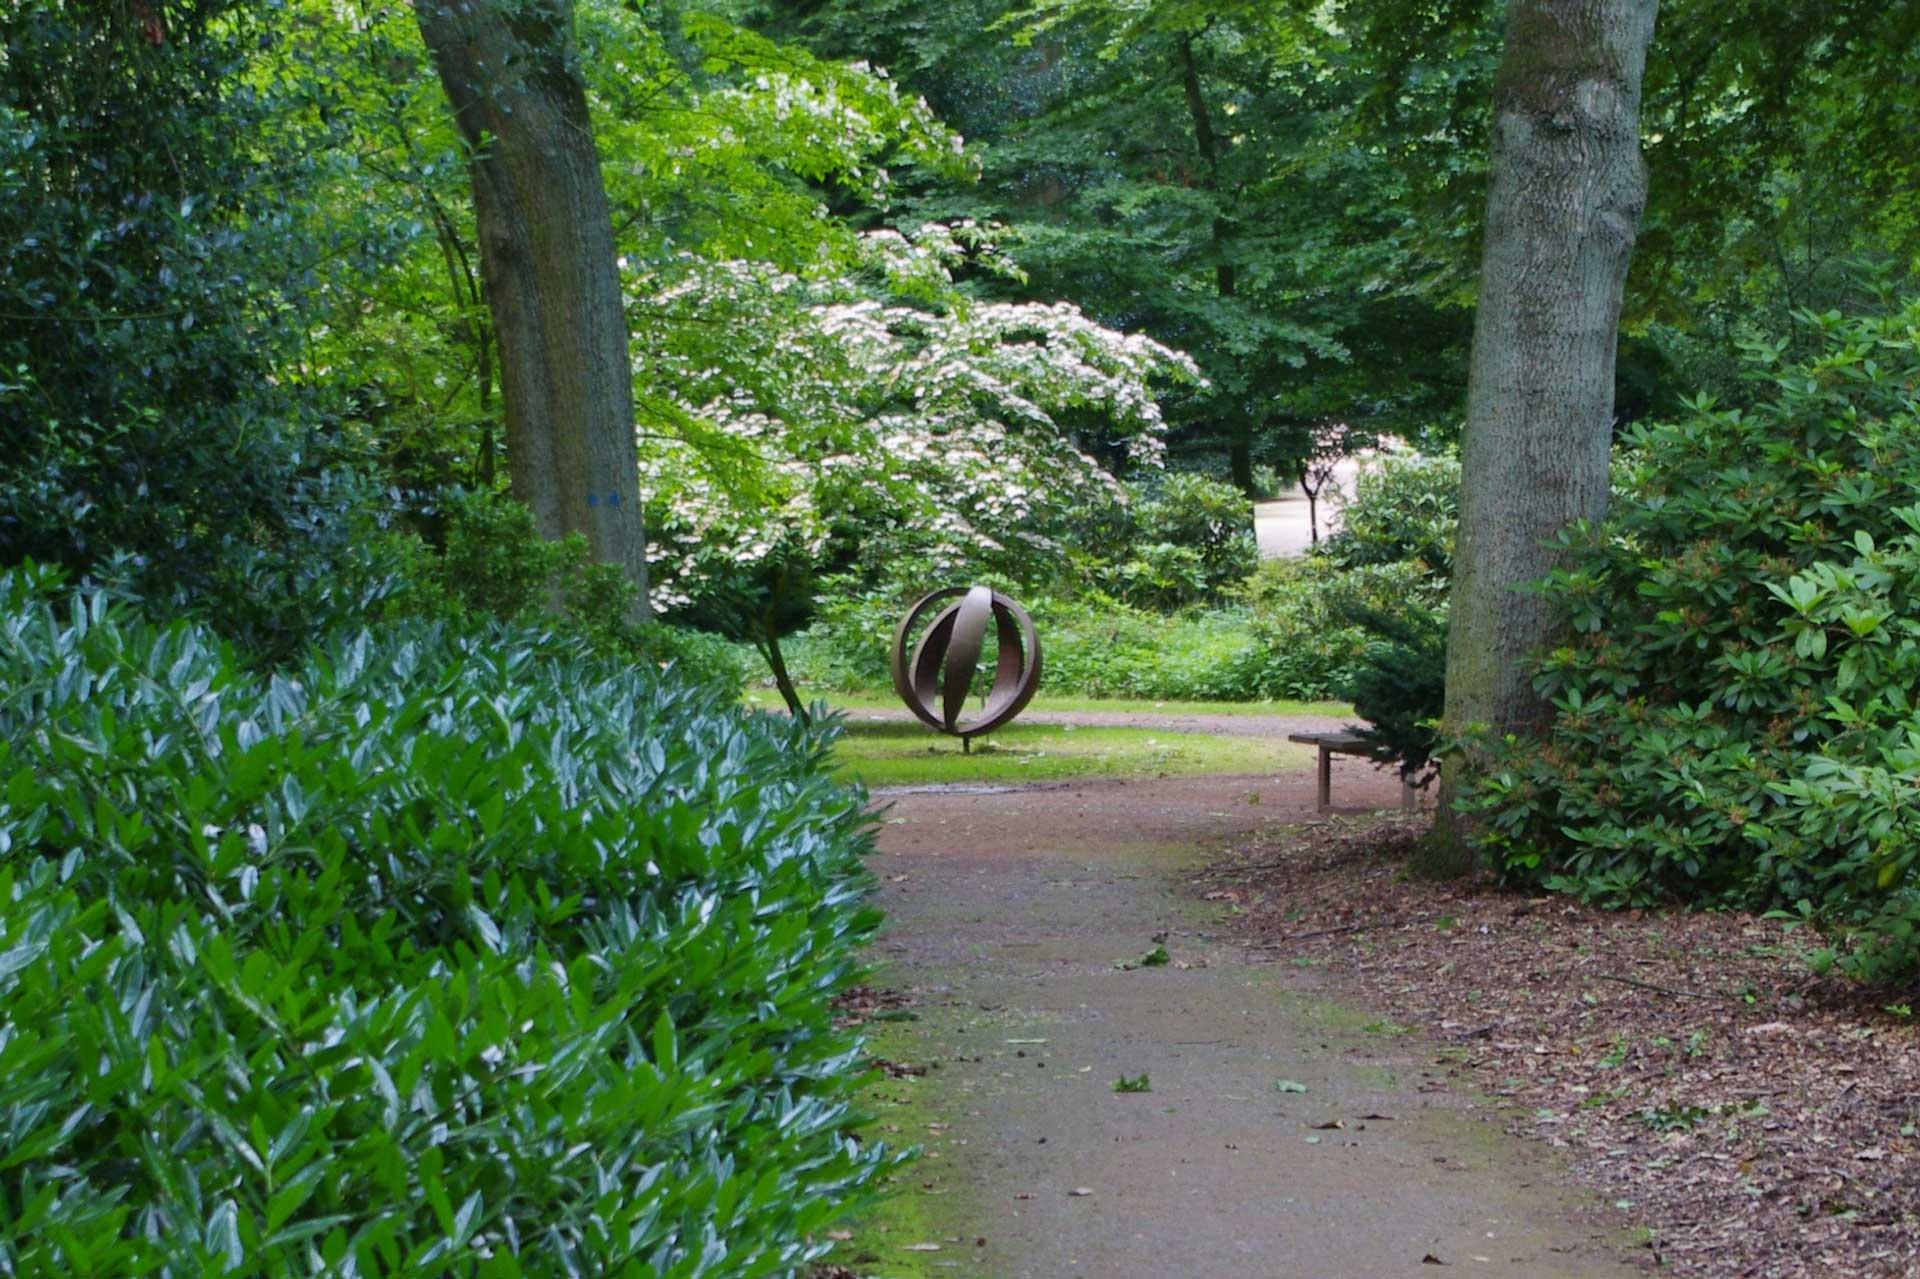 Erdkugel - Skulptur von Sandra Robertz im Bunten Garten Mönchengladbach